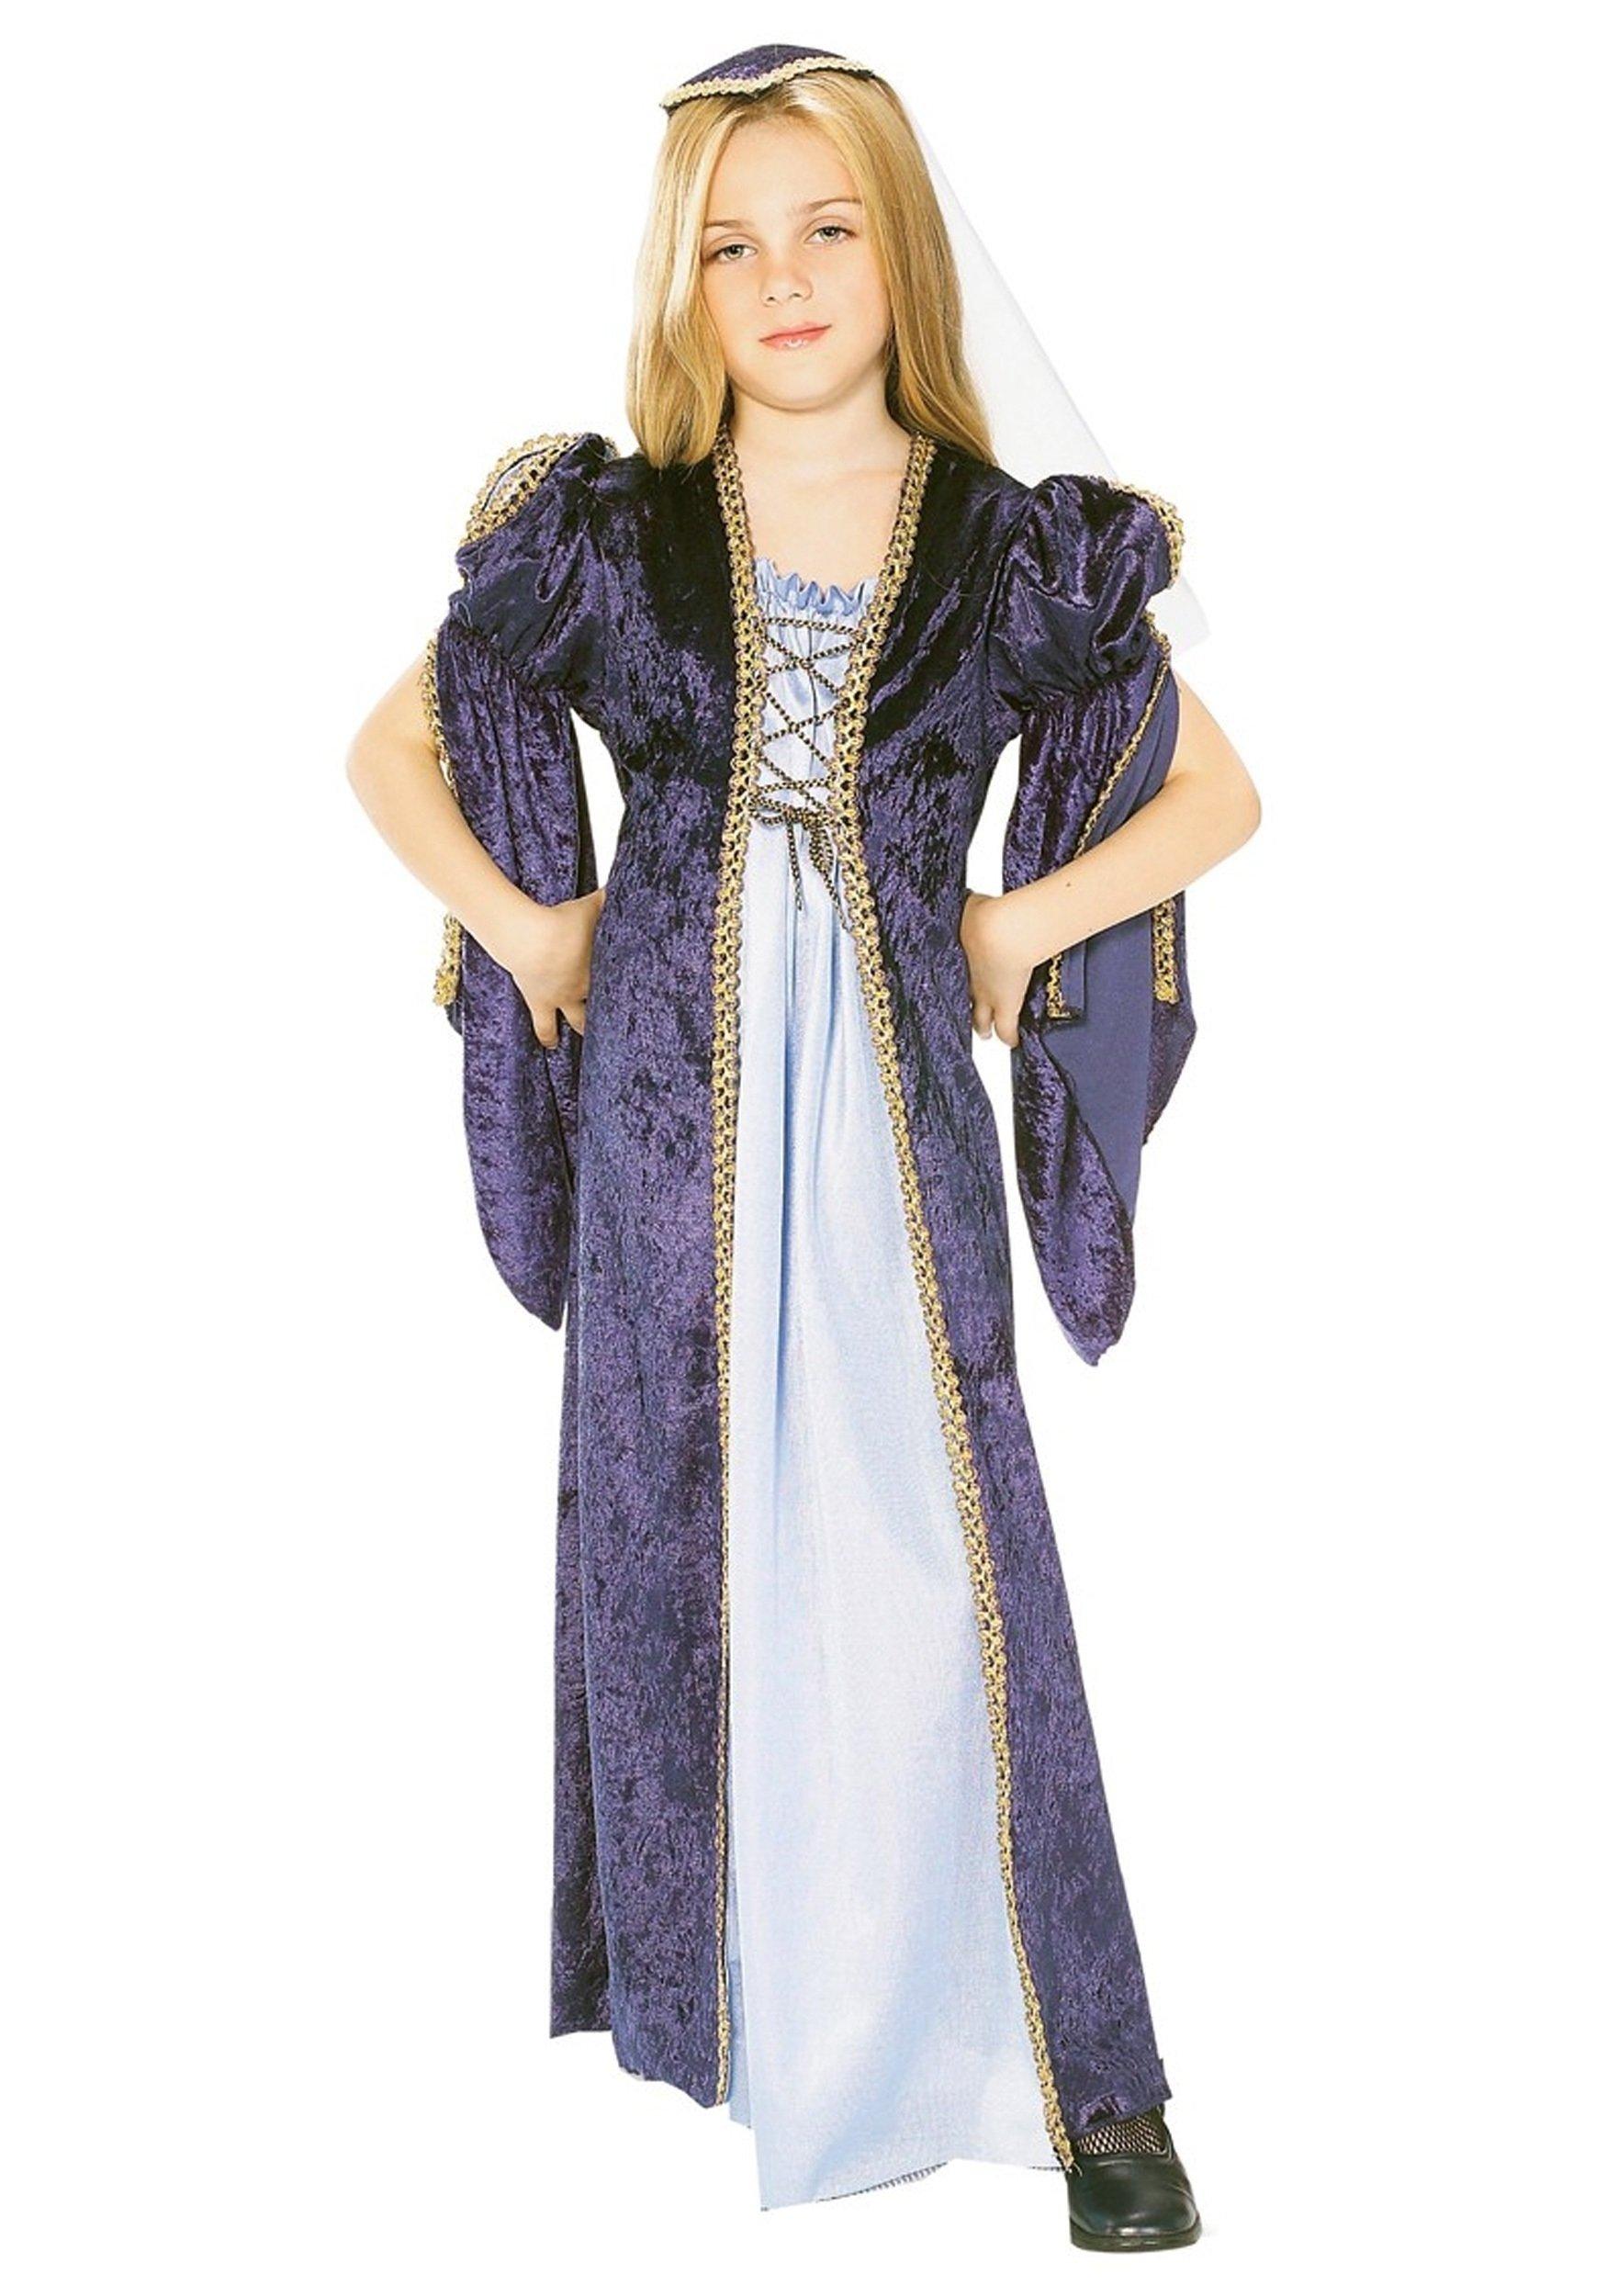 10 Fabulous Romeo And Juliet Costume Ideas girls juliet costume 2020